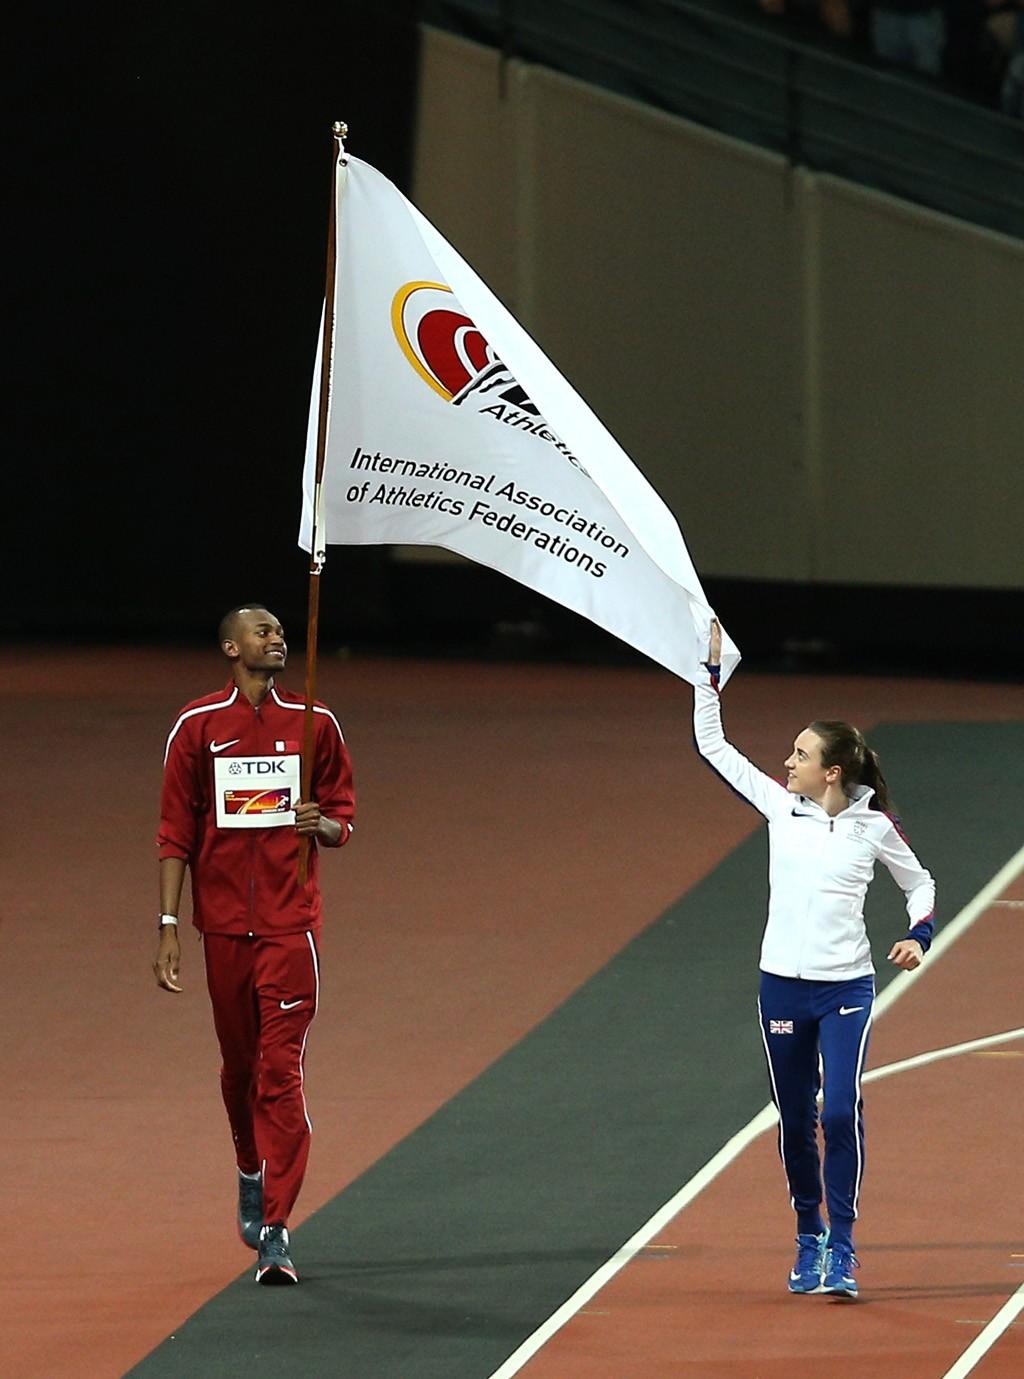 Dr Thani Al Kuwari, President of the QAF, receives IAAF flag from Lord Coe, President IAAF alongside Mutaz Barshim